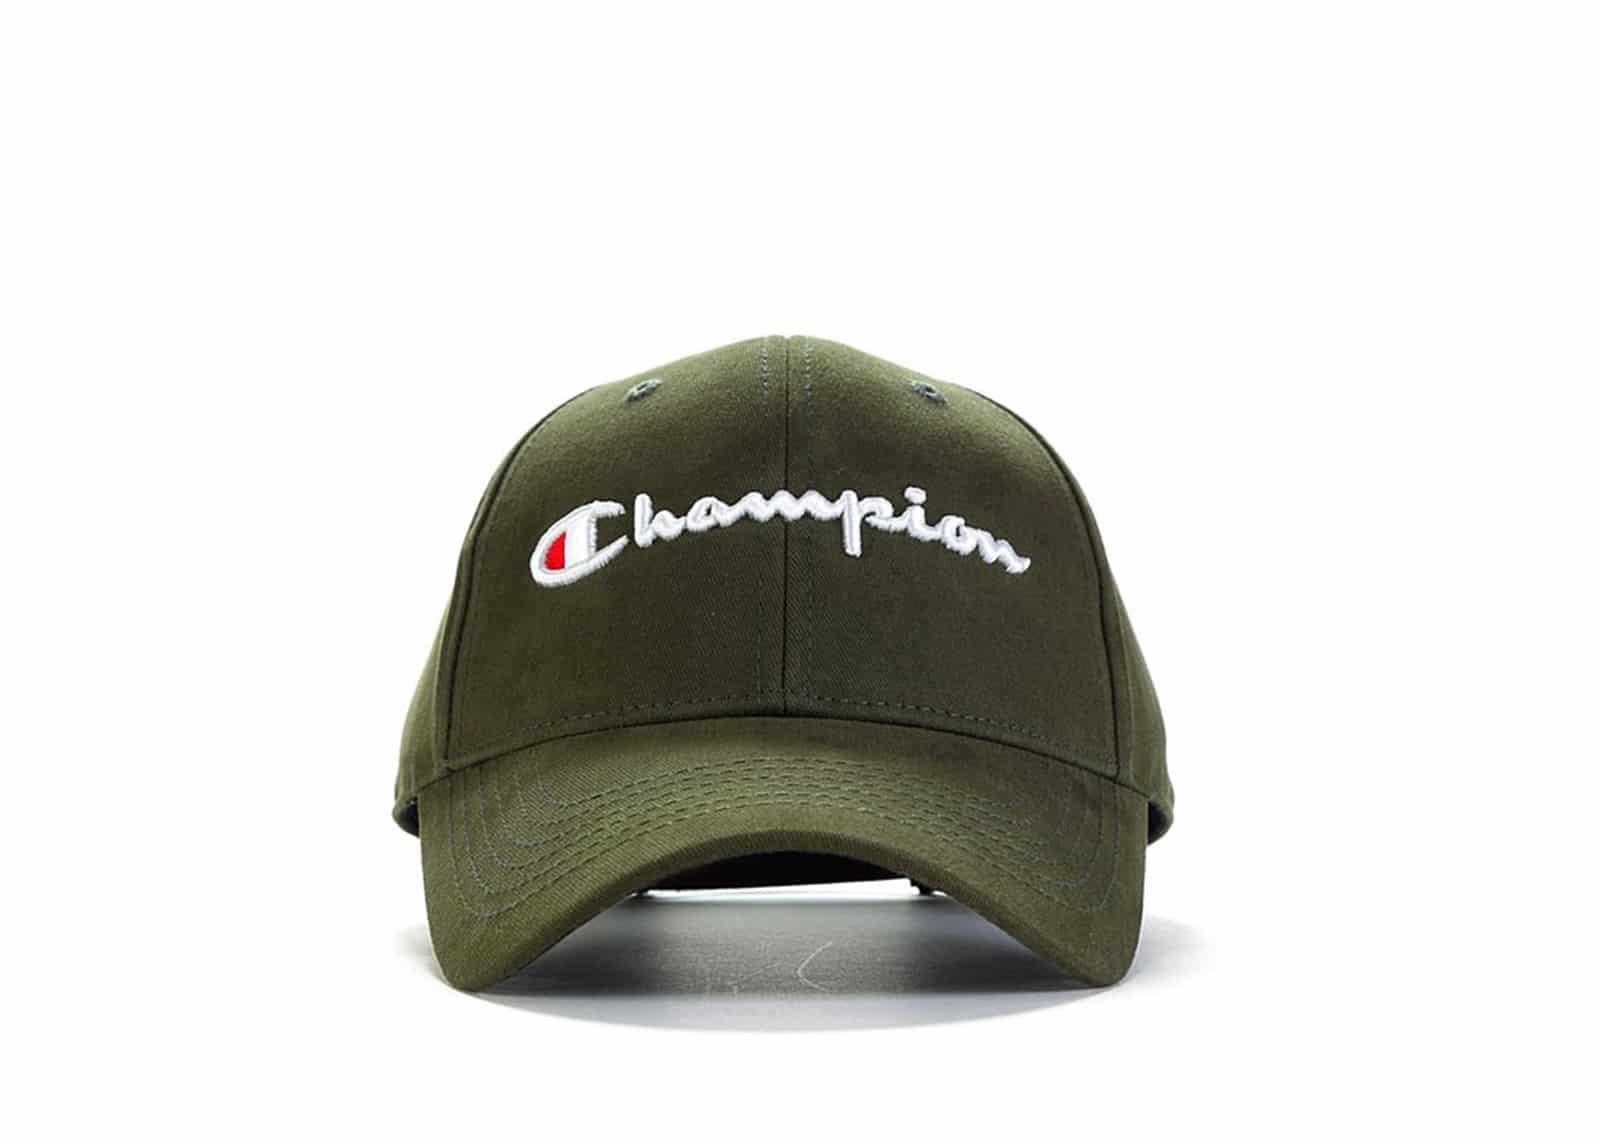 f8e3879bc8311 ... Champion Classic Twill Cap Hiker Green. Filter. Previous. Next